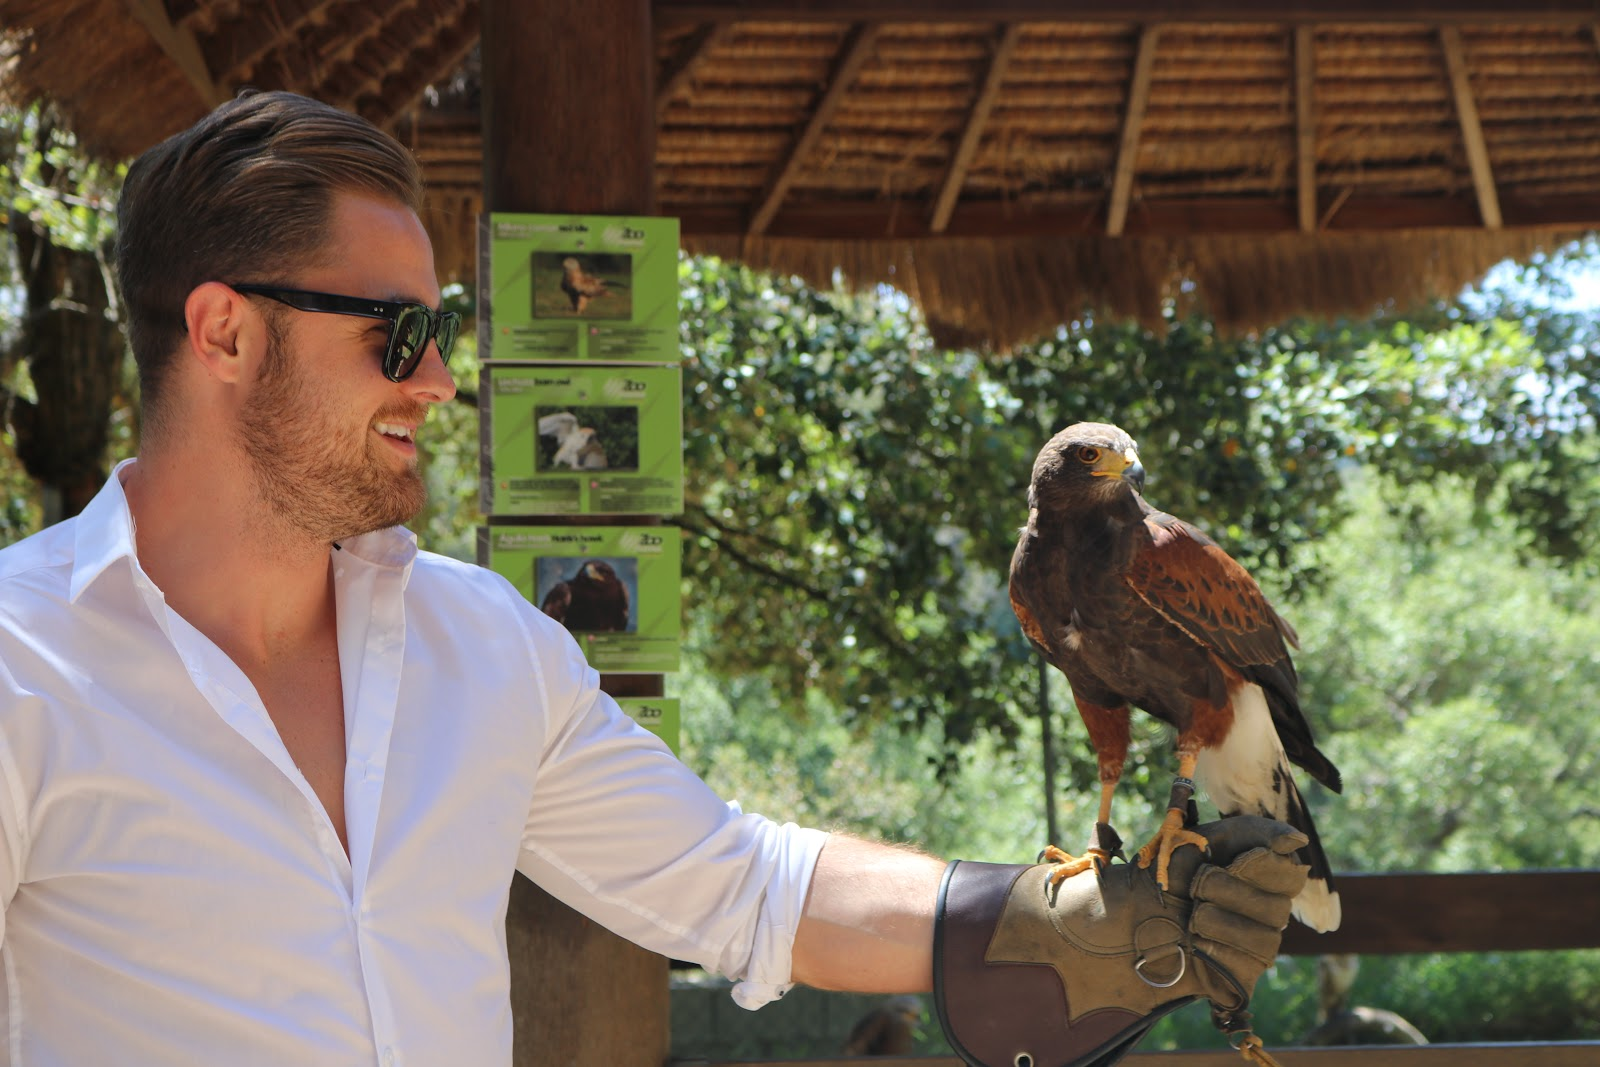 Ben Heath, Twenty First Century Gent with an eagle in Zoo De Castellar, Spain